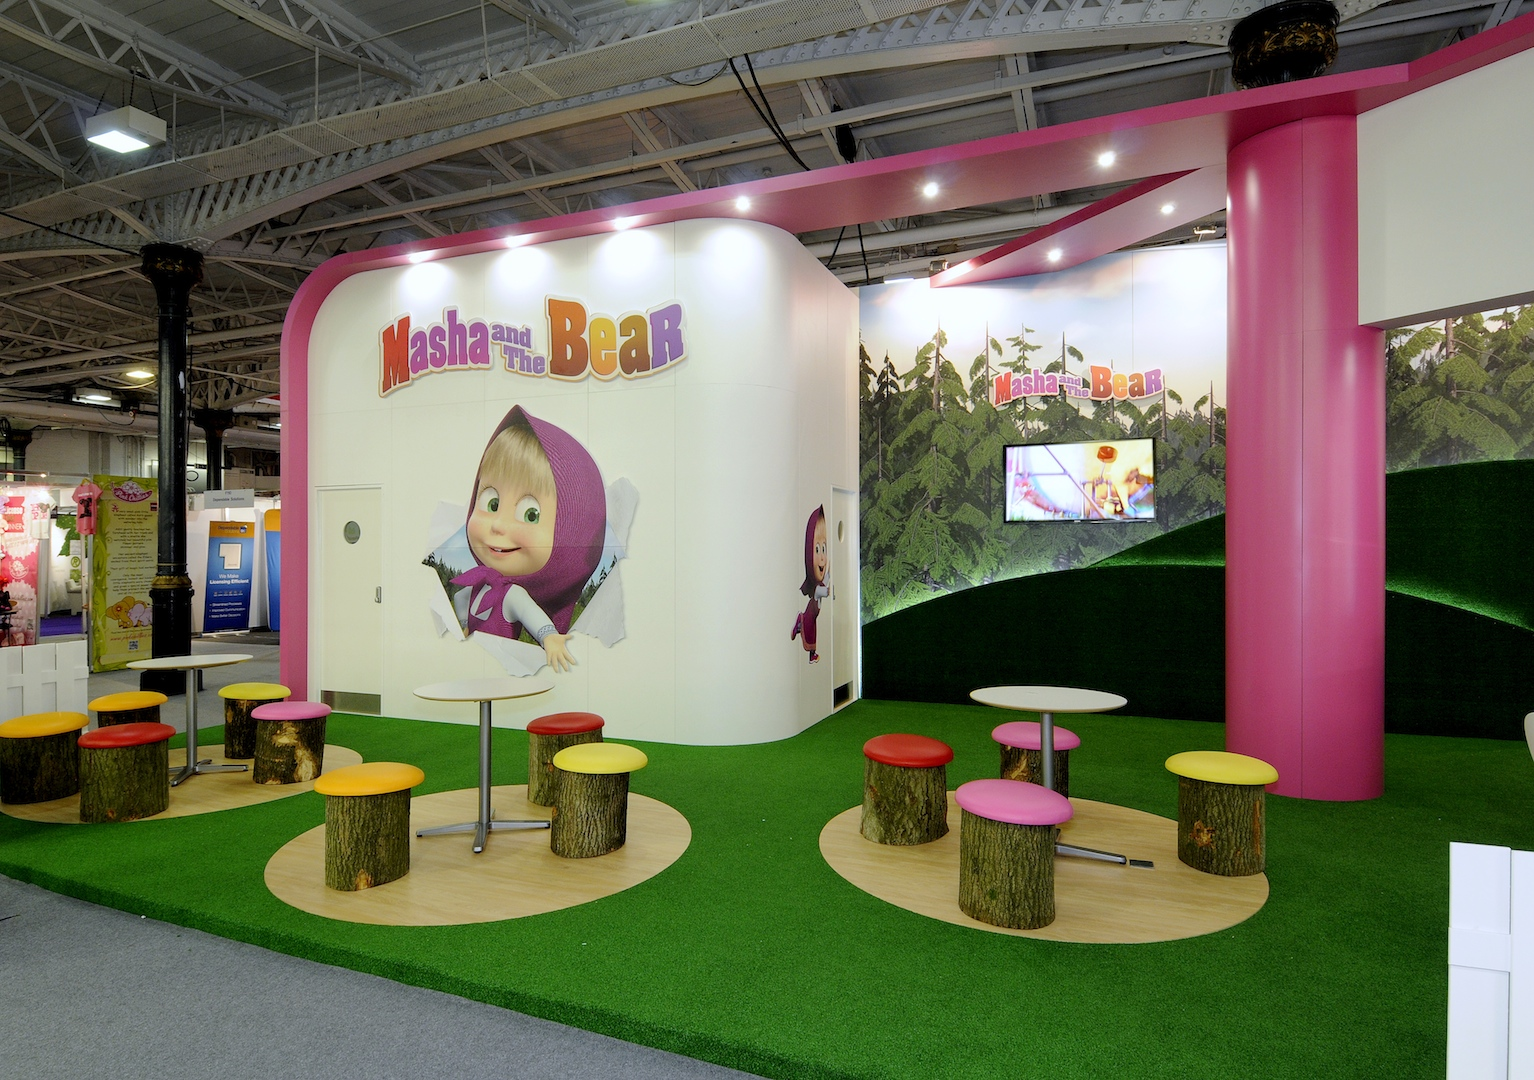 Stand Masha et Michka animation meet and greet event